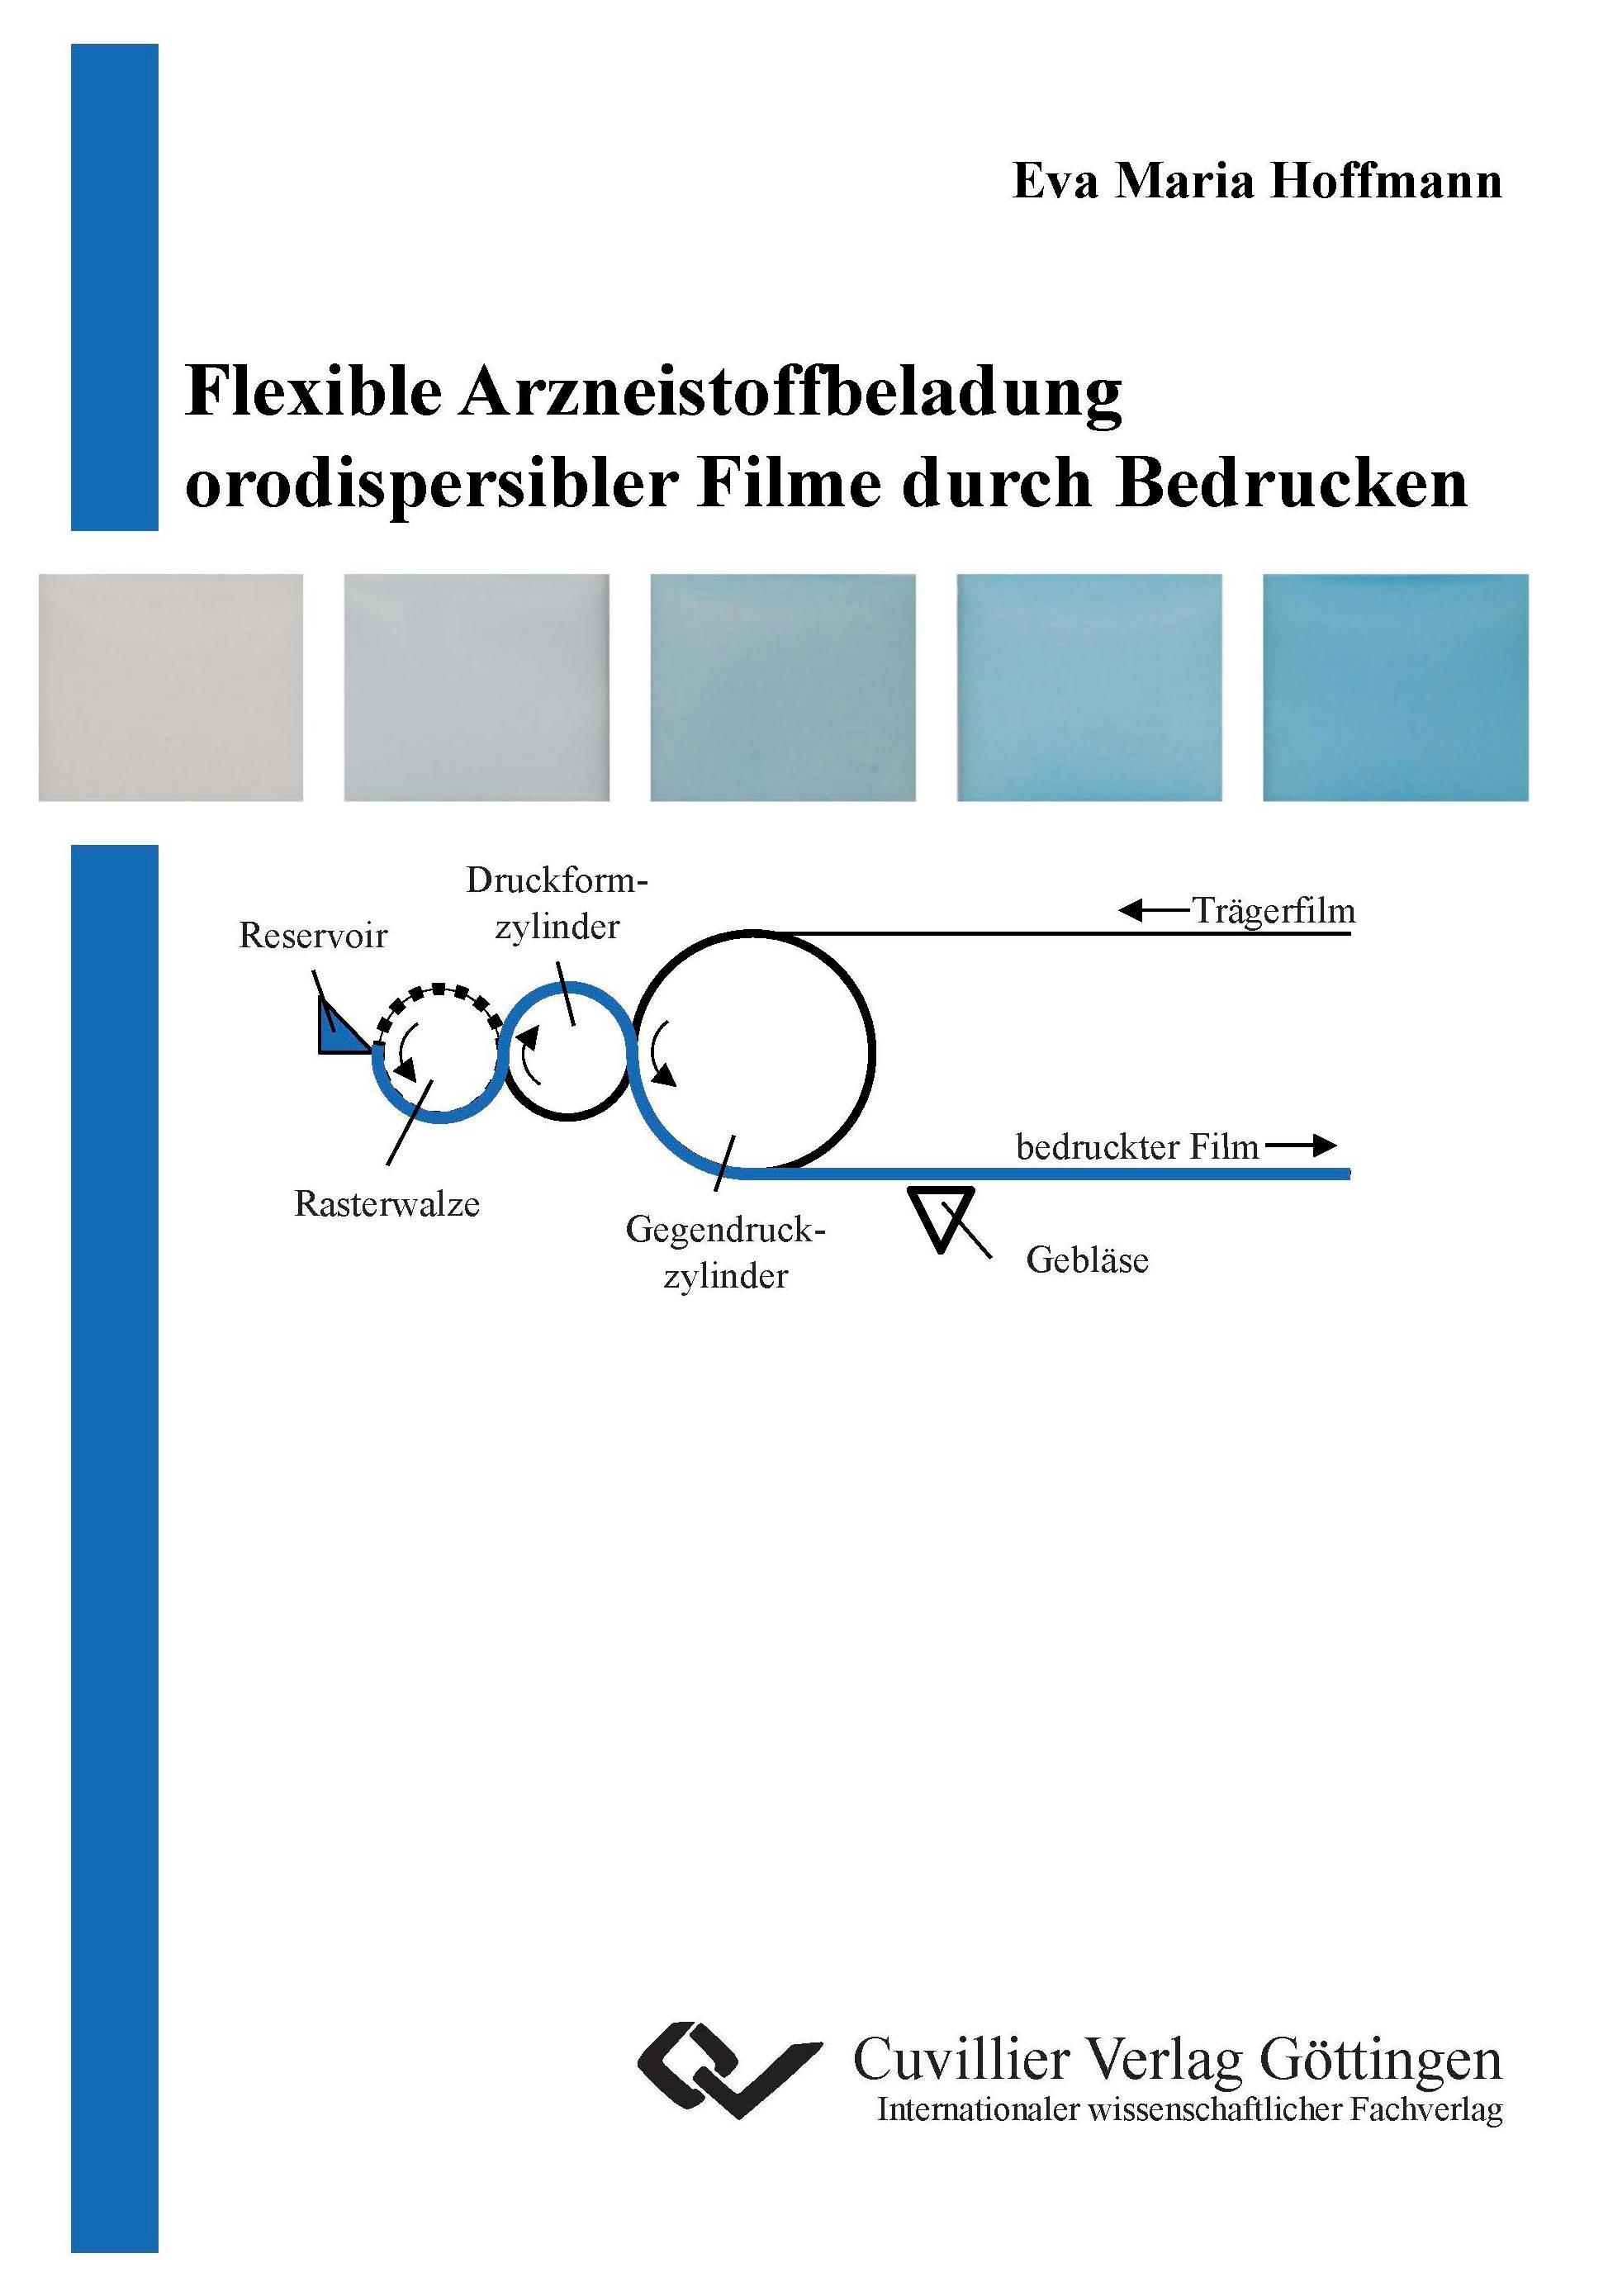 Flexible Arzneistoffbeladung orodispersibler Filme durch Bedrucken Hoffmann Buch